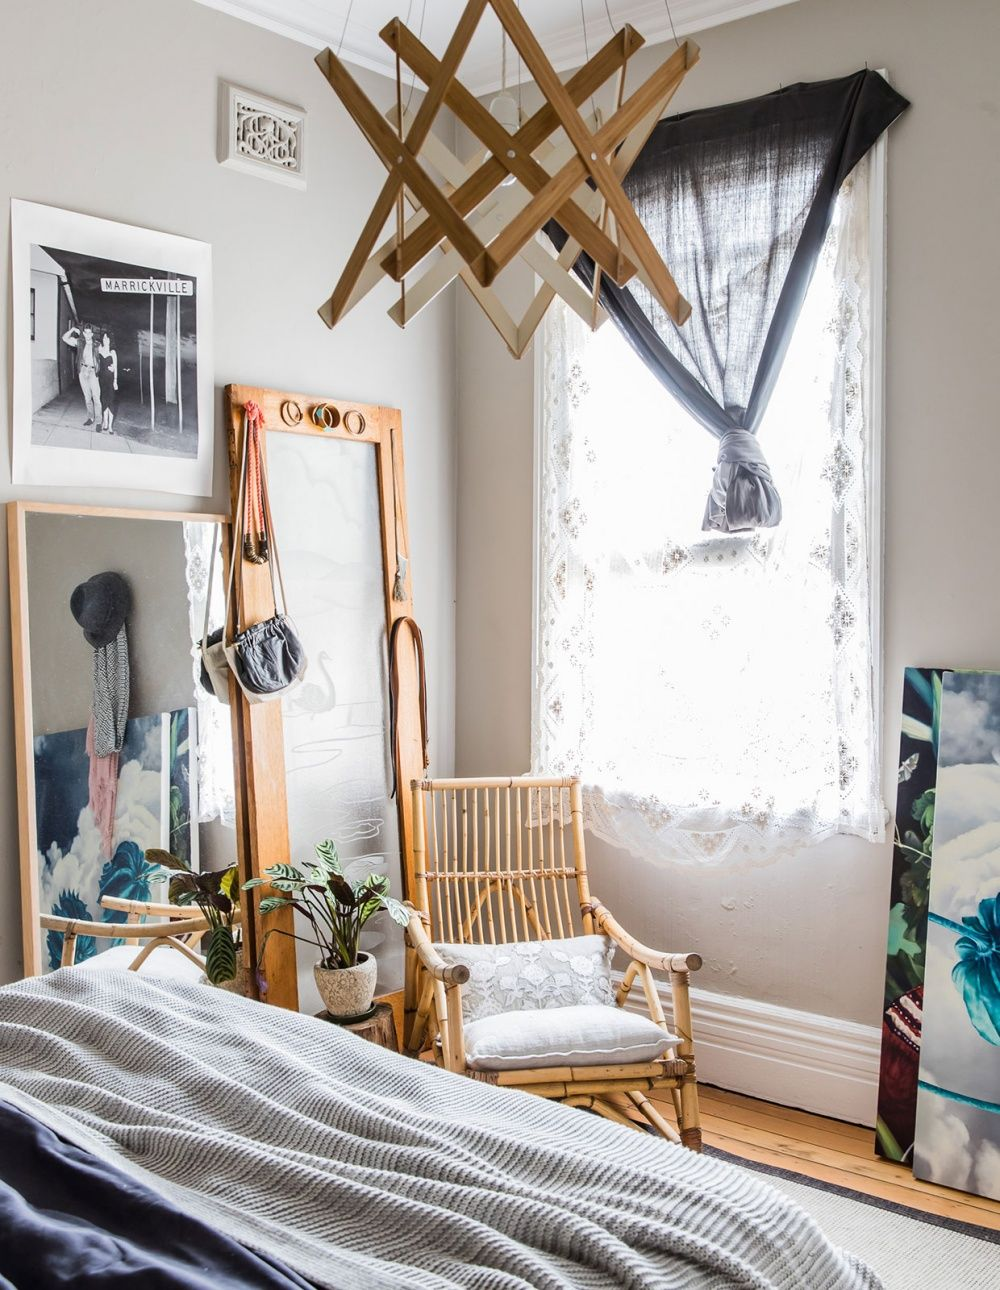 An artistus eclectic home in enmore sydney home décor pinterest